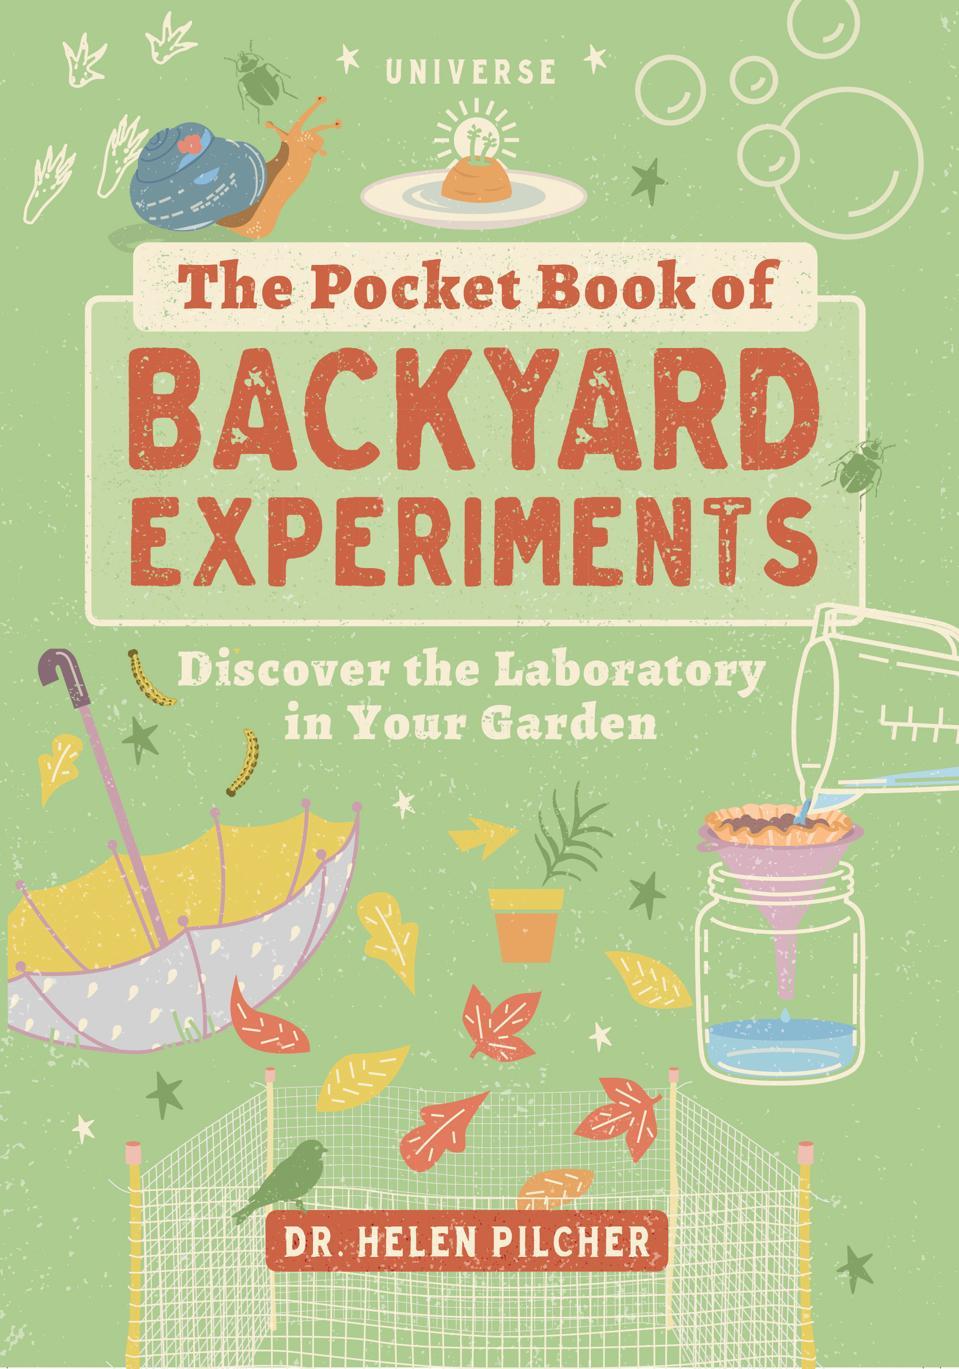 ″Pocket Book of Backyard Experiments″ book